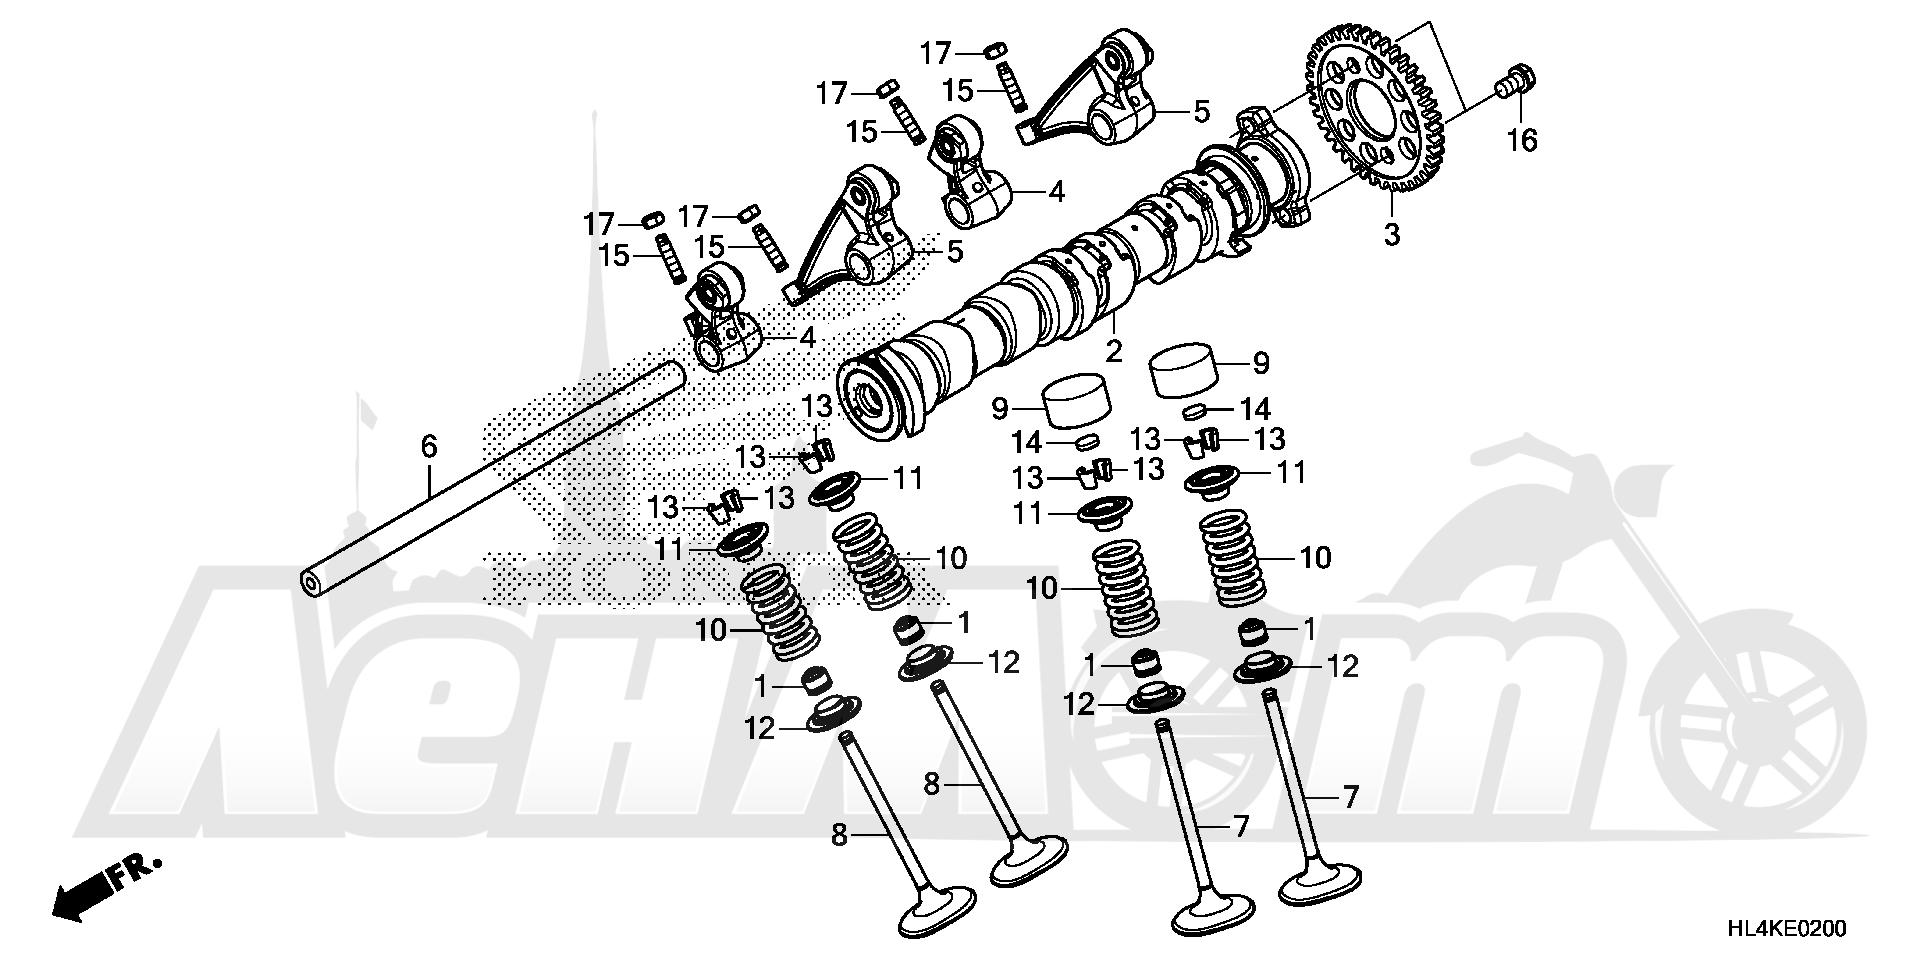 Запчасти для Квадроцикла Honda 2019 SXS1000M5P Раздел: CAMSHAFT AND VALVE | распредвал и клапан